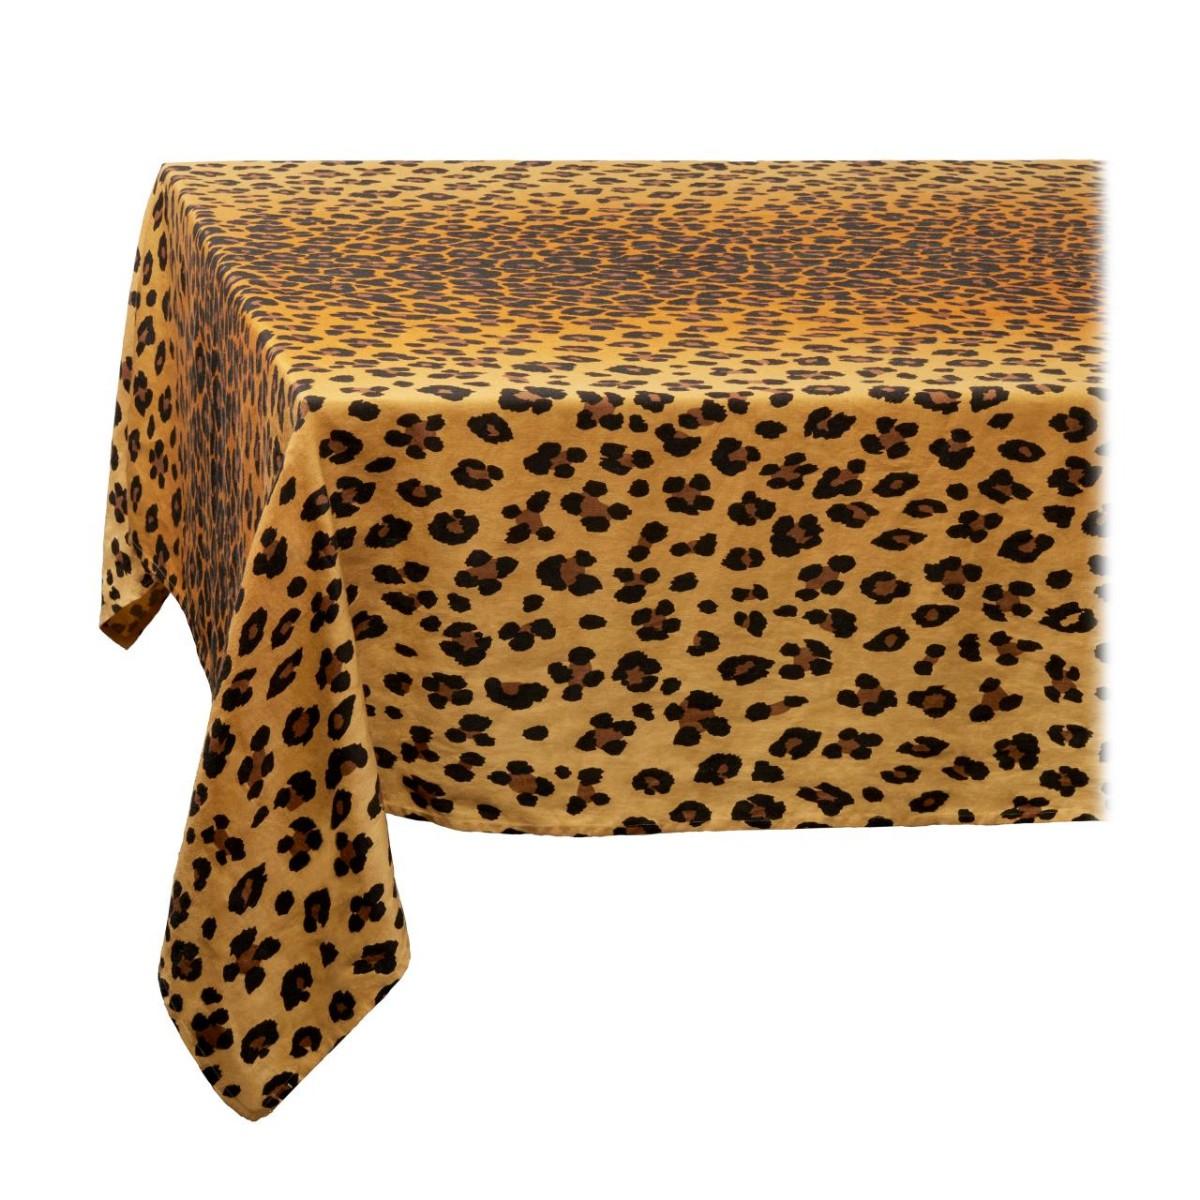 L'Objet I Linen Sateen Tablecloth I Large I Leopard - Natural